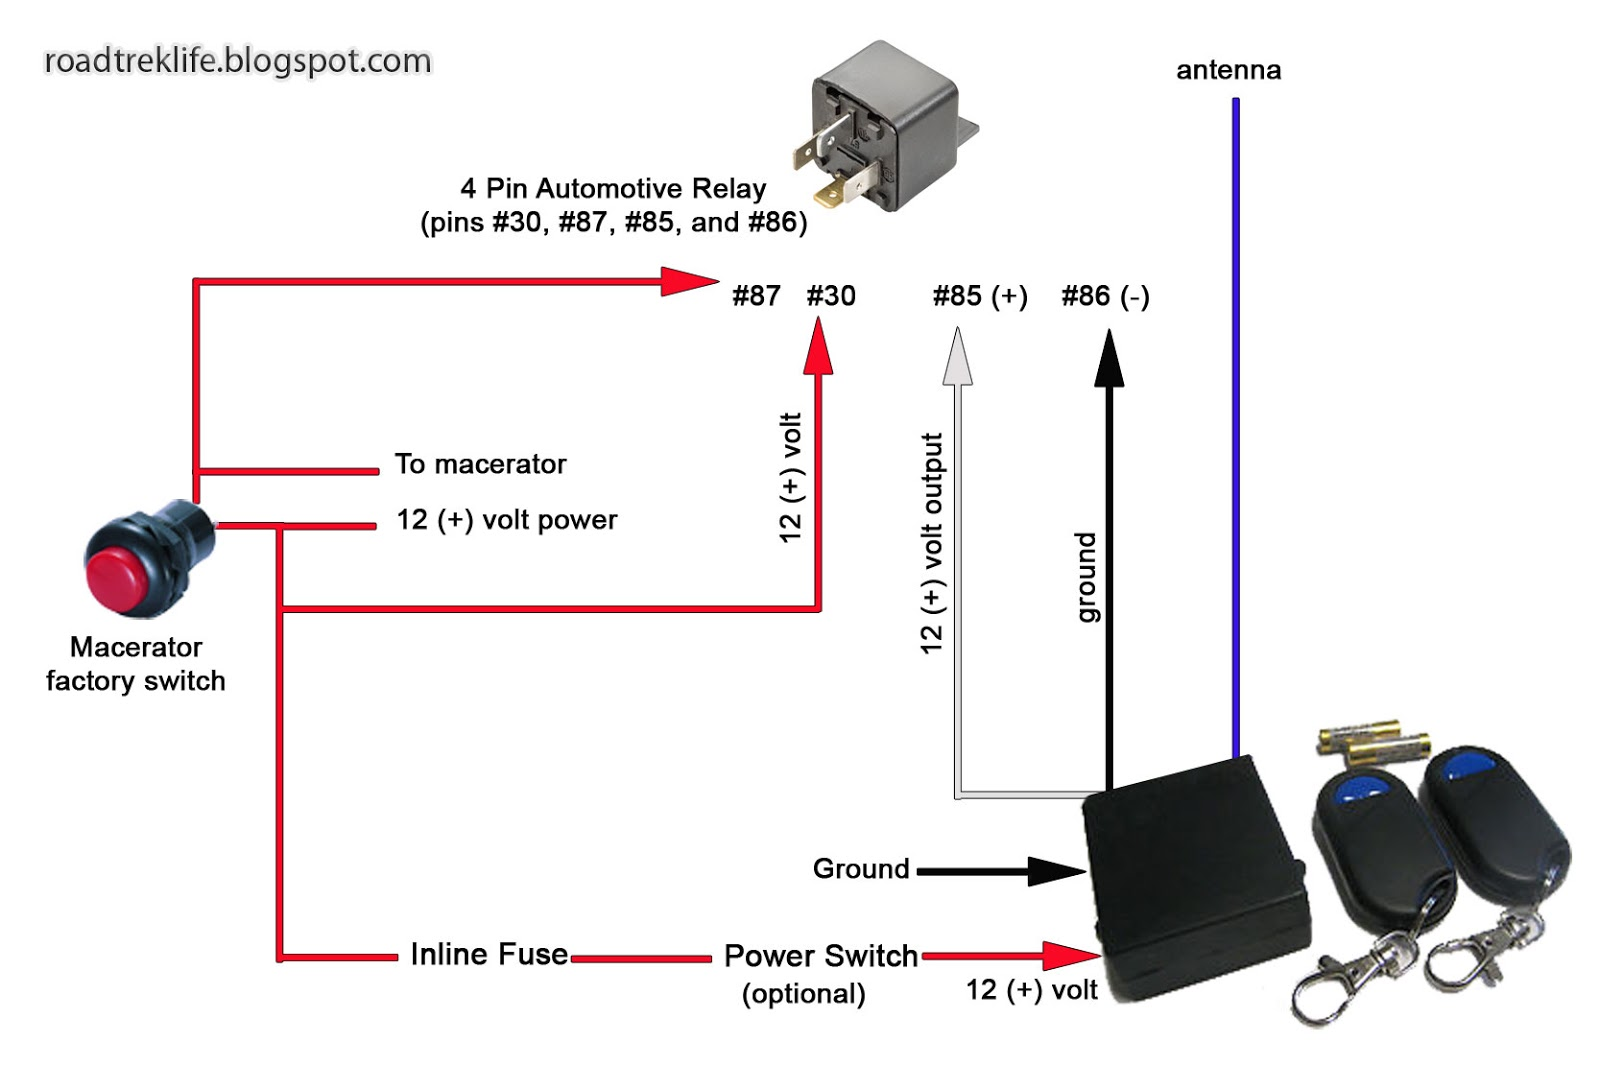 wiring diagram roadtrek e trek wiring diagram used wiring diagram roadtrek e trek [ 1600 x 1065 Pixel ]